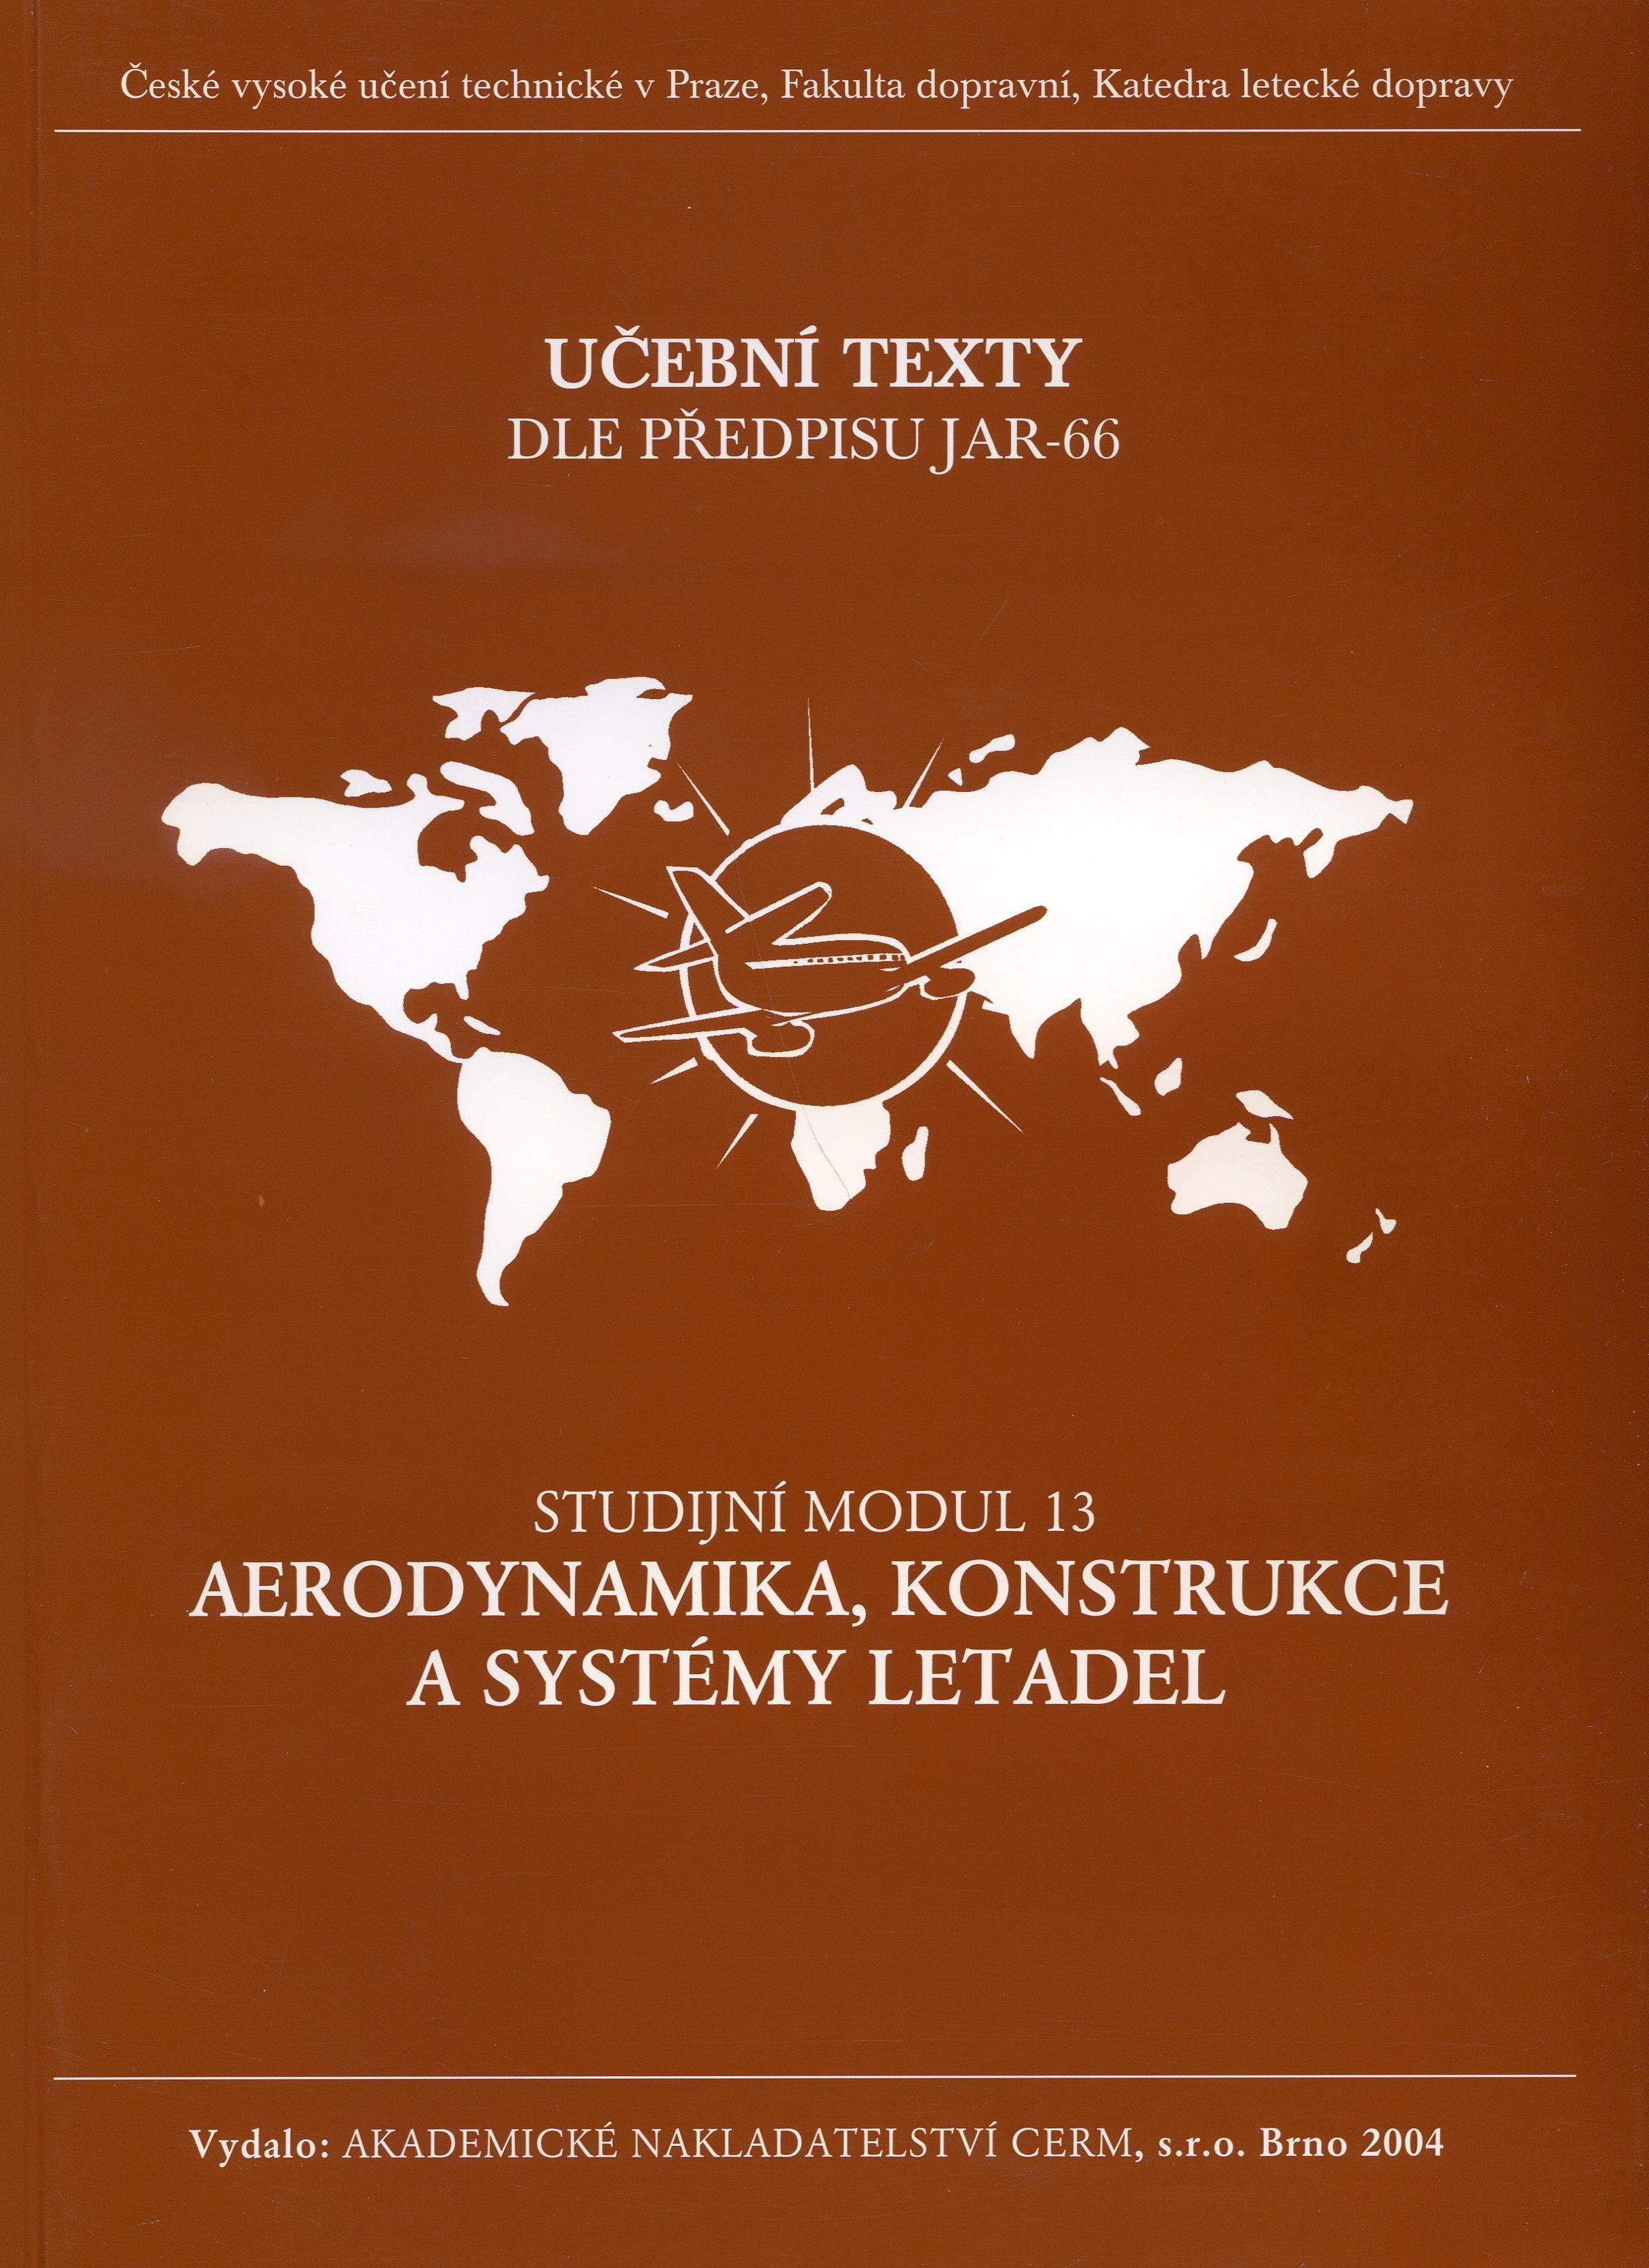 Aerodynamika,konstrukce a systémy letadel - modul 13